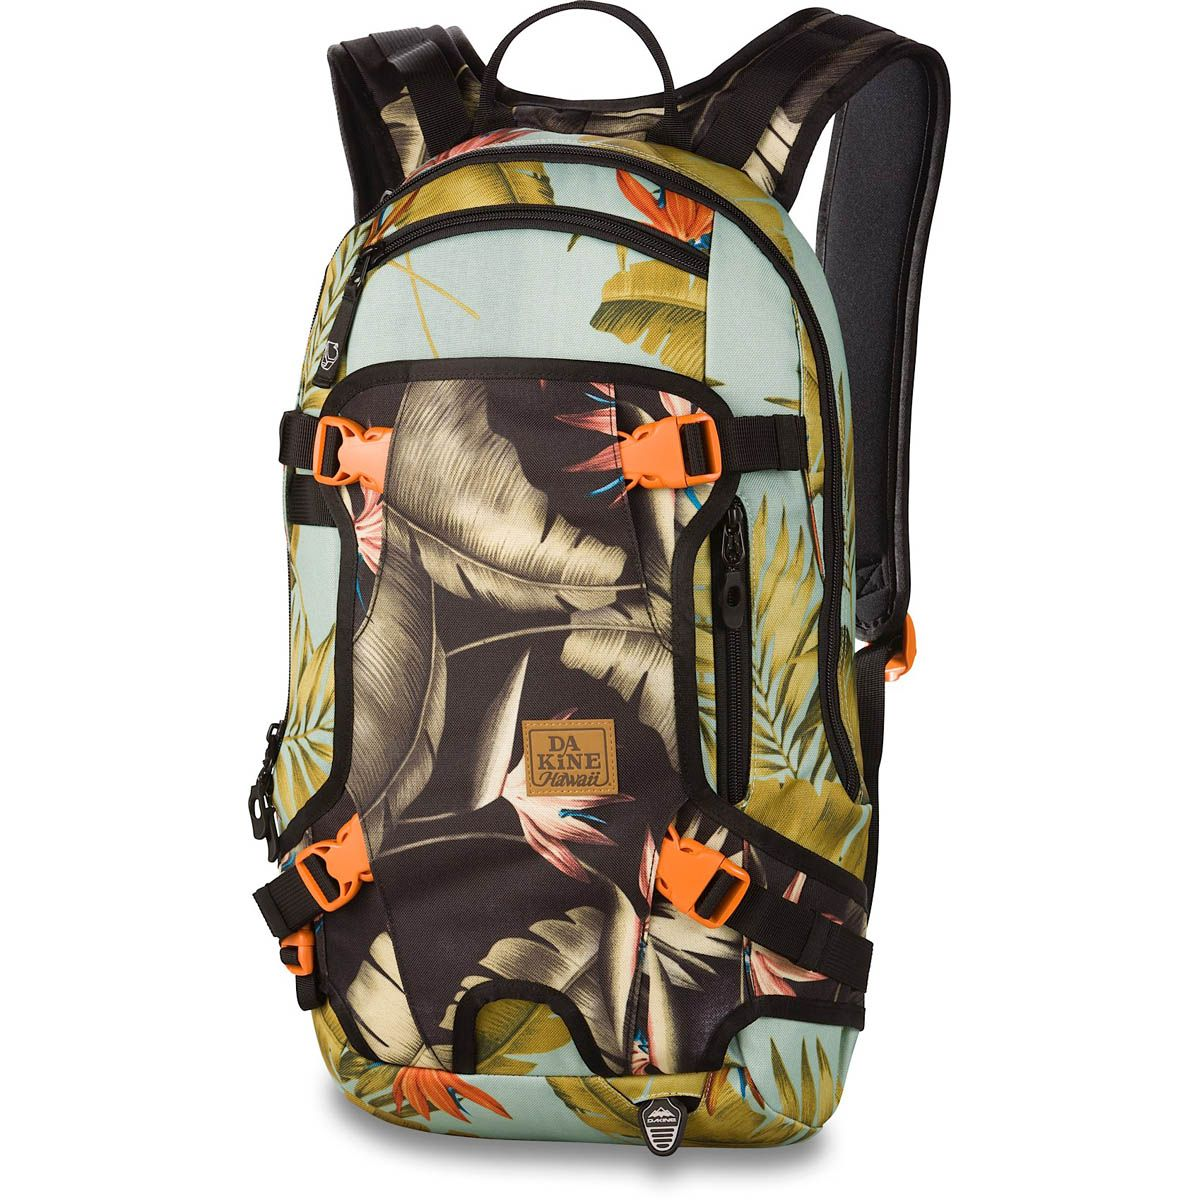 Dakine Heli Pack 11l Palm Http Www Dakine Shop De De Dakine Heli Pack 11l Snowboard Ski Rucksack Palmint Bags Dakine Bagpack